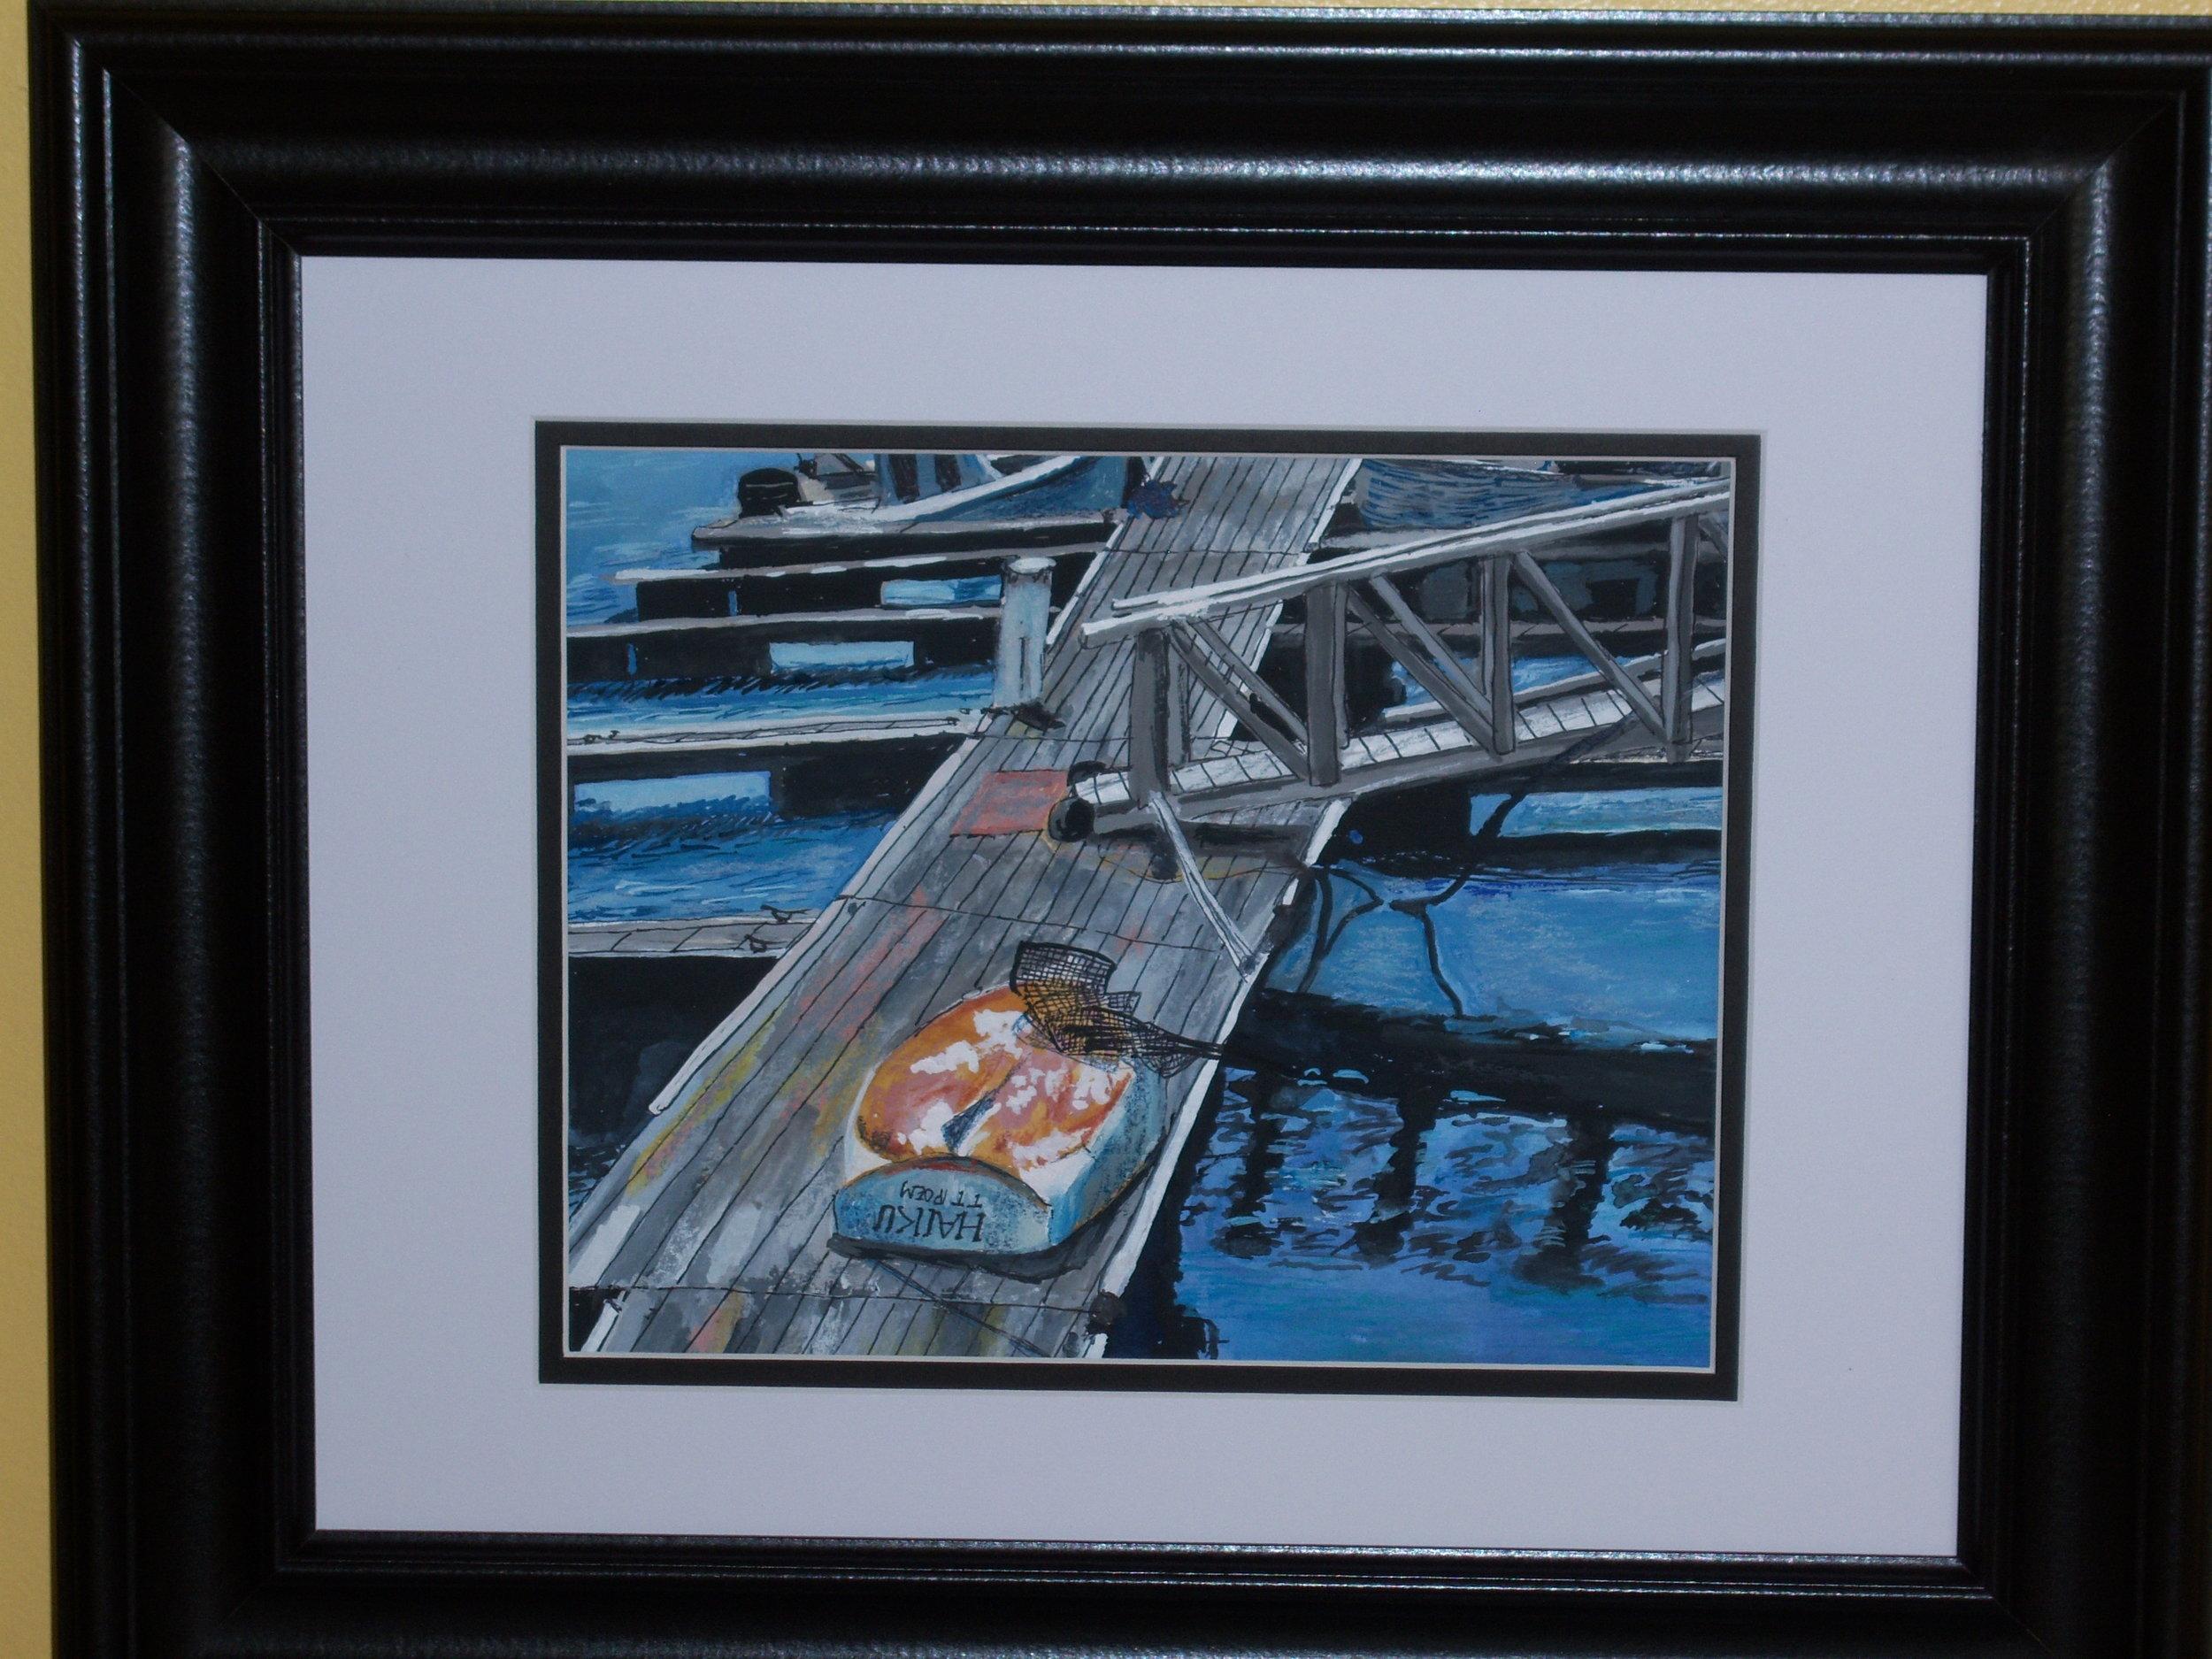 SusanKing_RockportMA-8x10-GouachePenPencil-$200.JPG